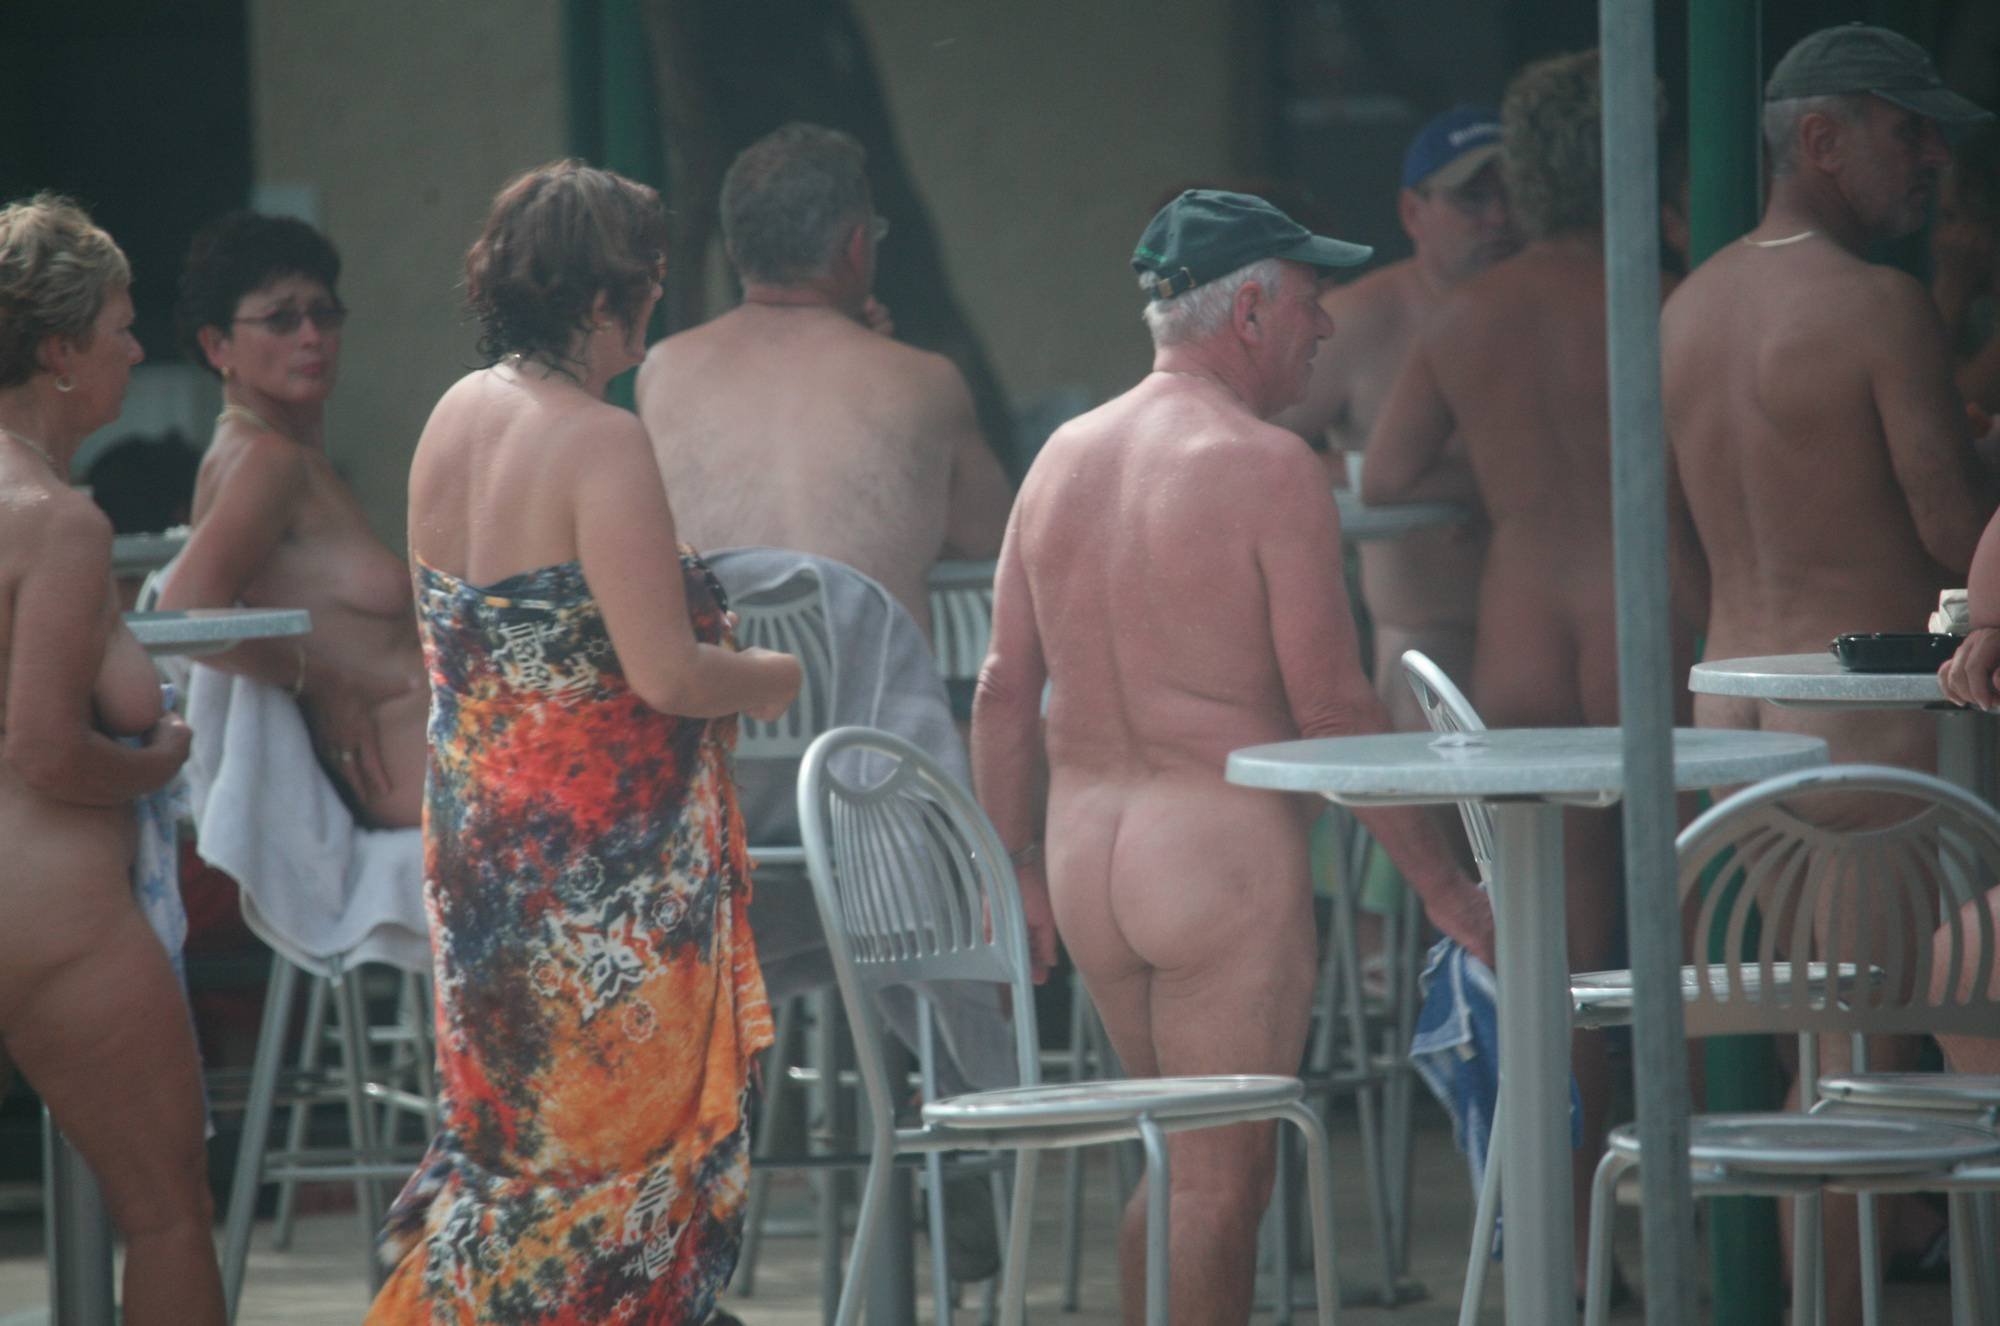 Nudist Pics Crete FKK Light Dinning - 1